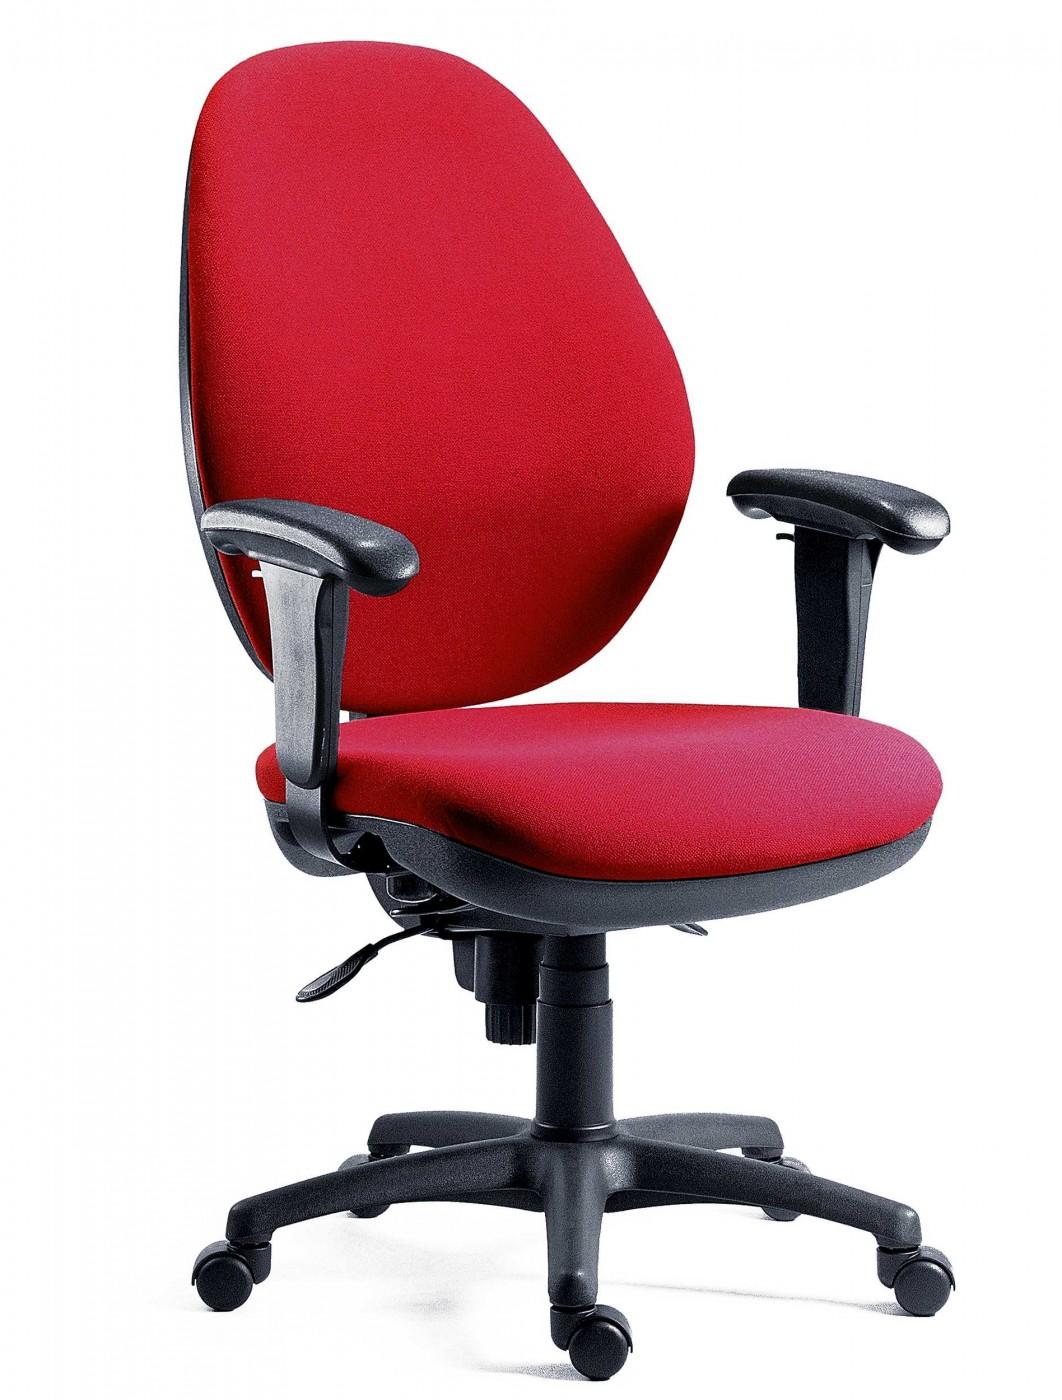 heavyweight office chair ofm triumph series lounge chair nashville office furniture